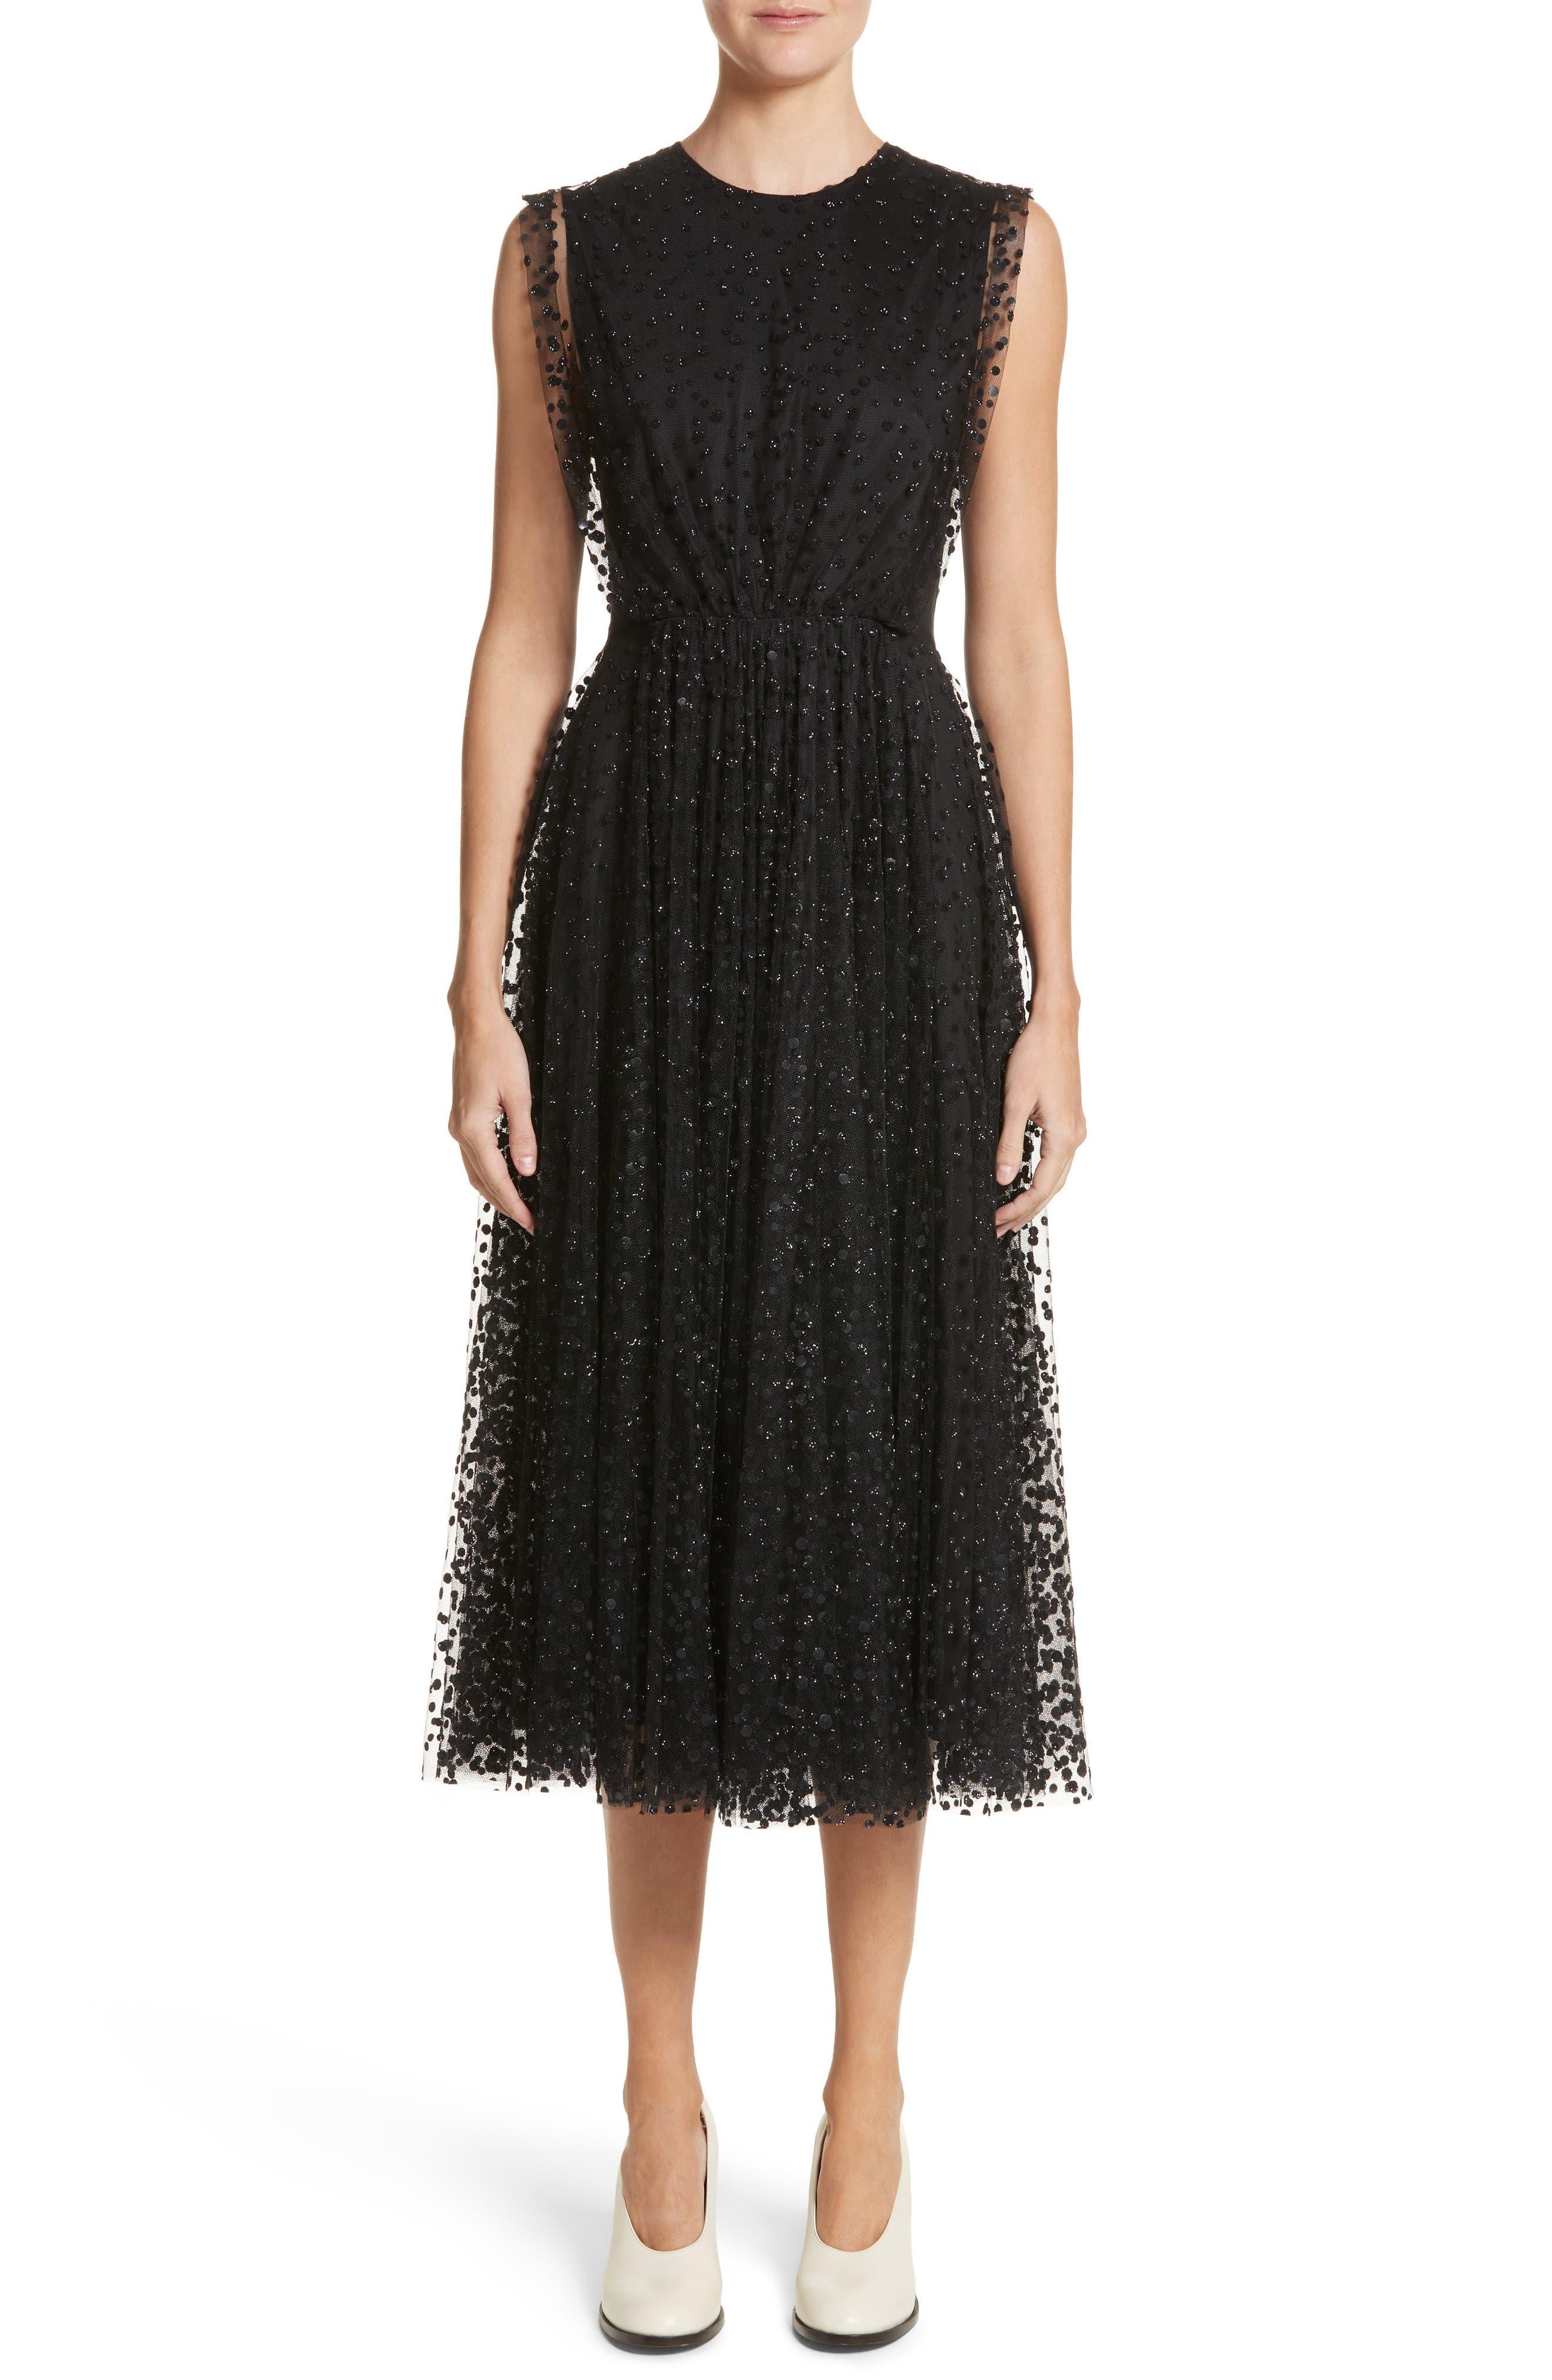 Co Sparkle Dot Tulle Midi Dress